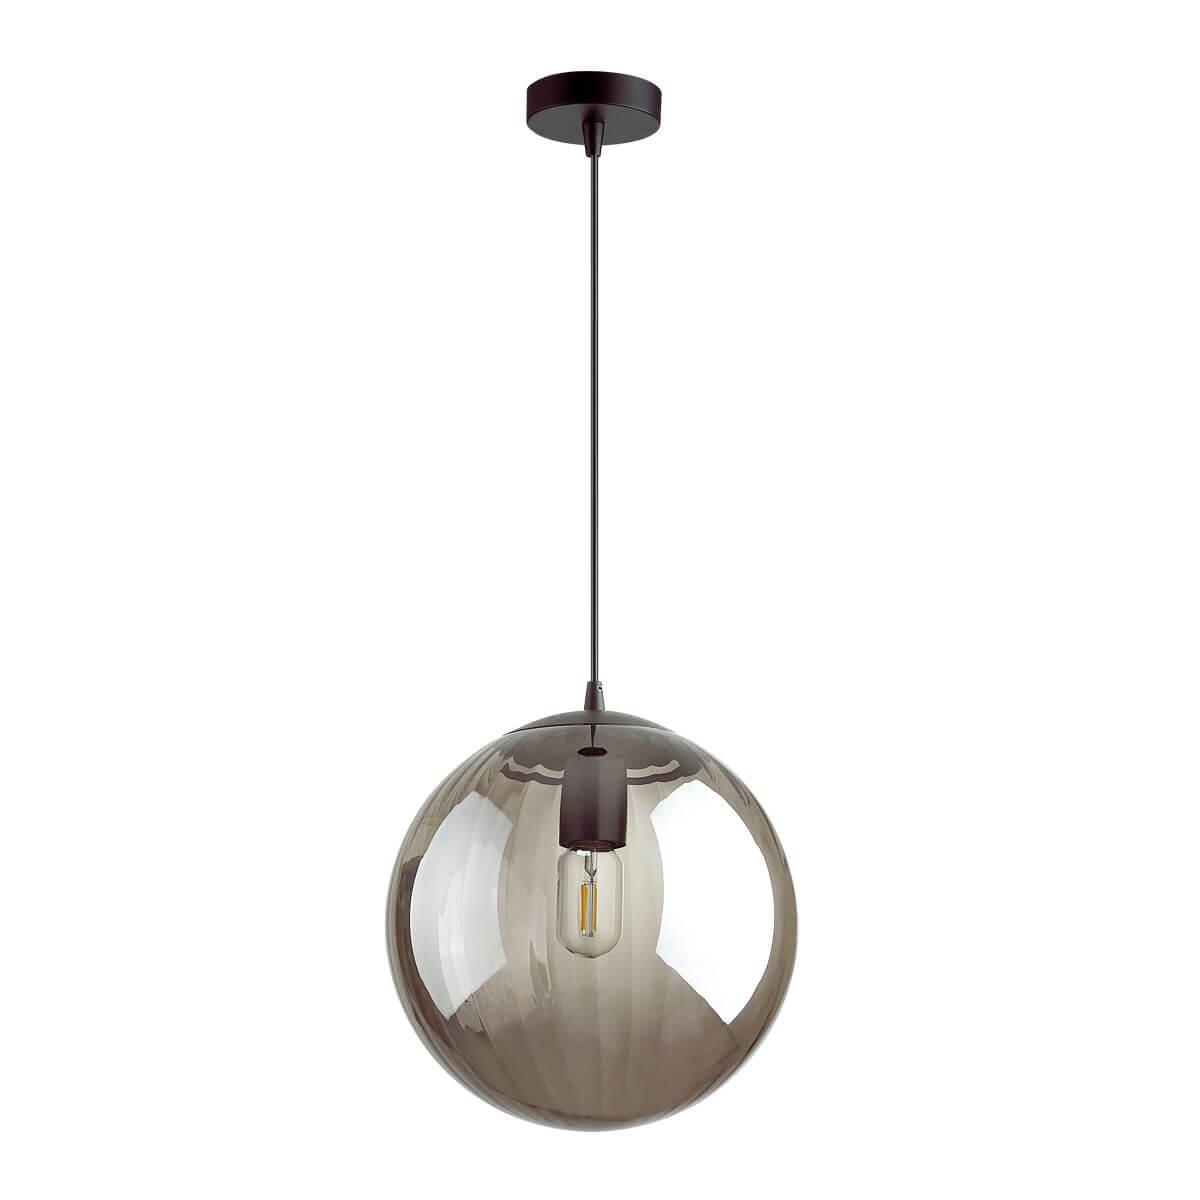 Светильник Odeon Light 4756/1 Pendant светильник odeon light 4140 1 pendant